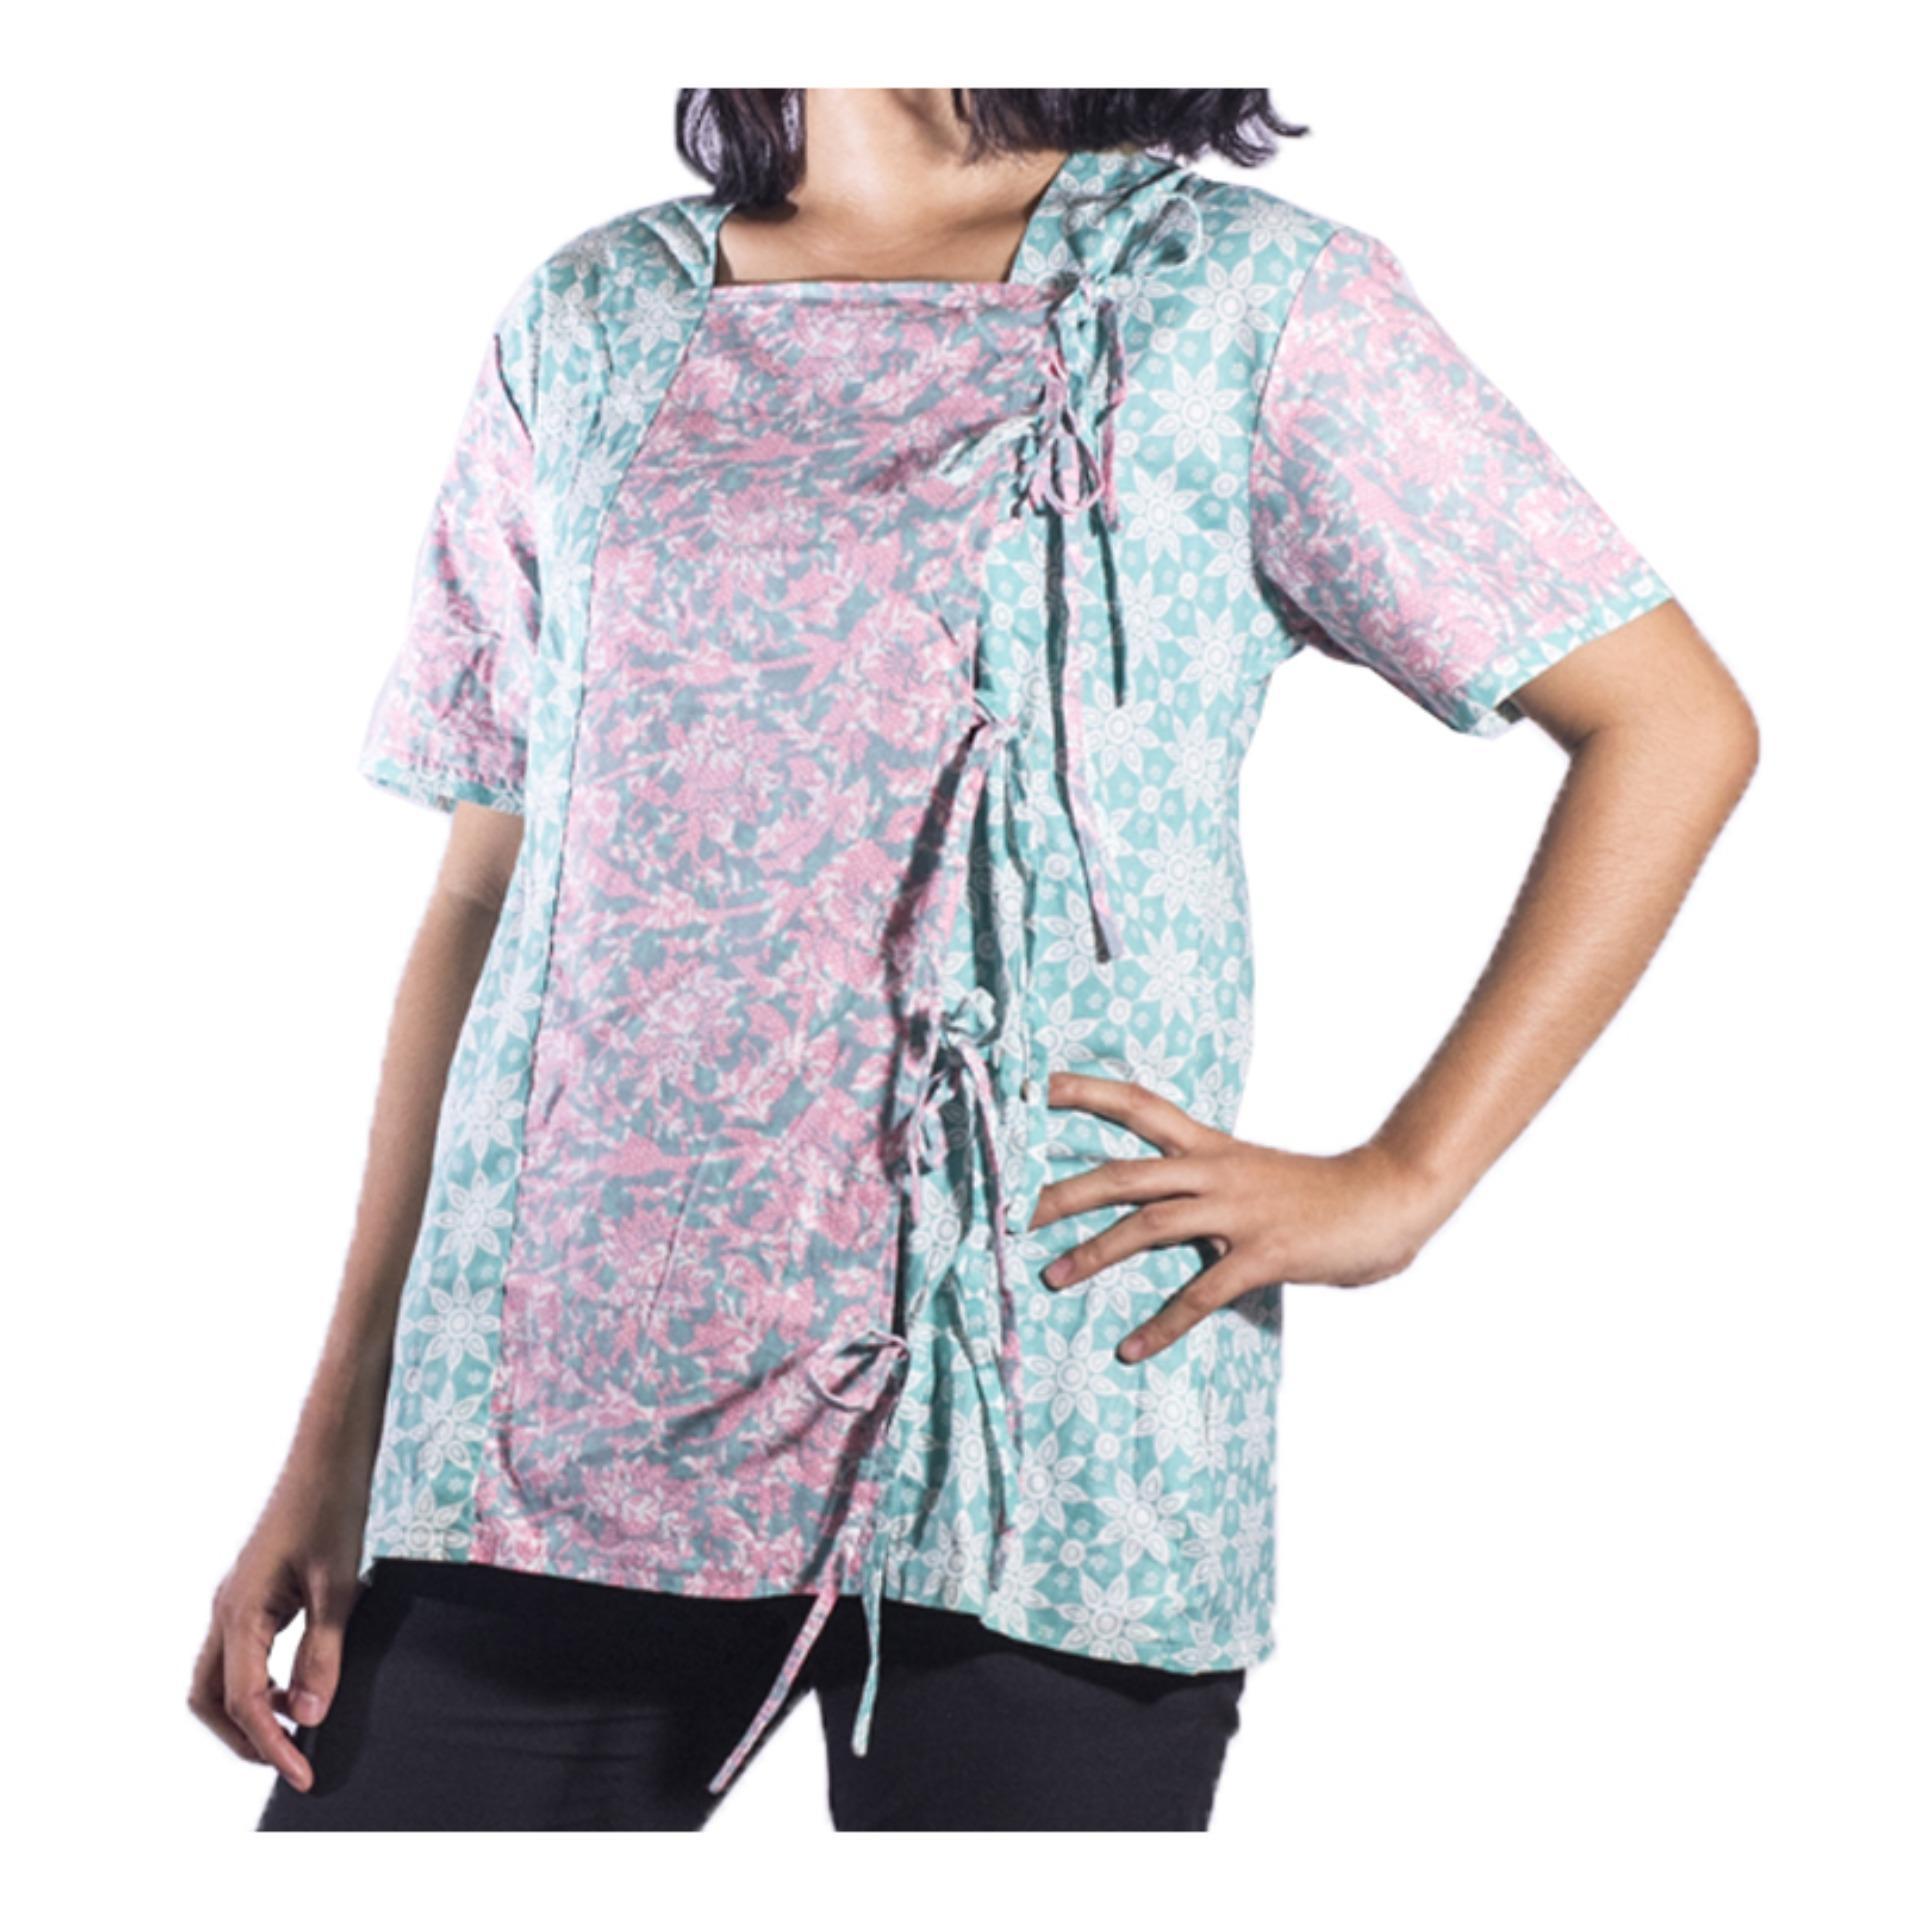 Mall BTM Fashion - Dina Collection Atasan Batik Jogja Murah Model Tali Ikat - Turquoise